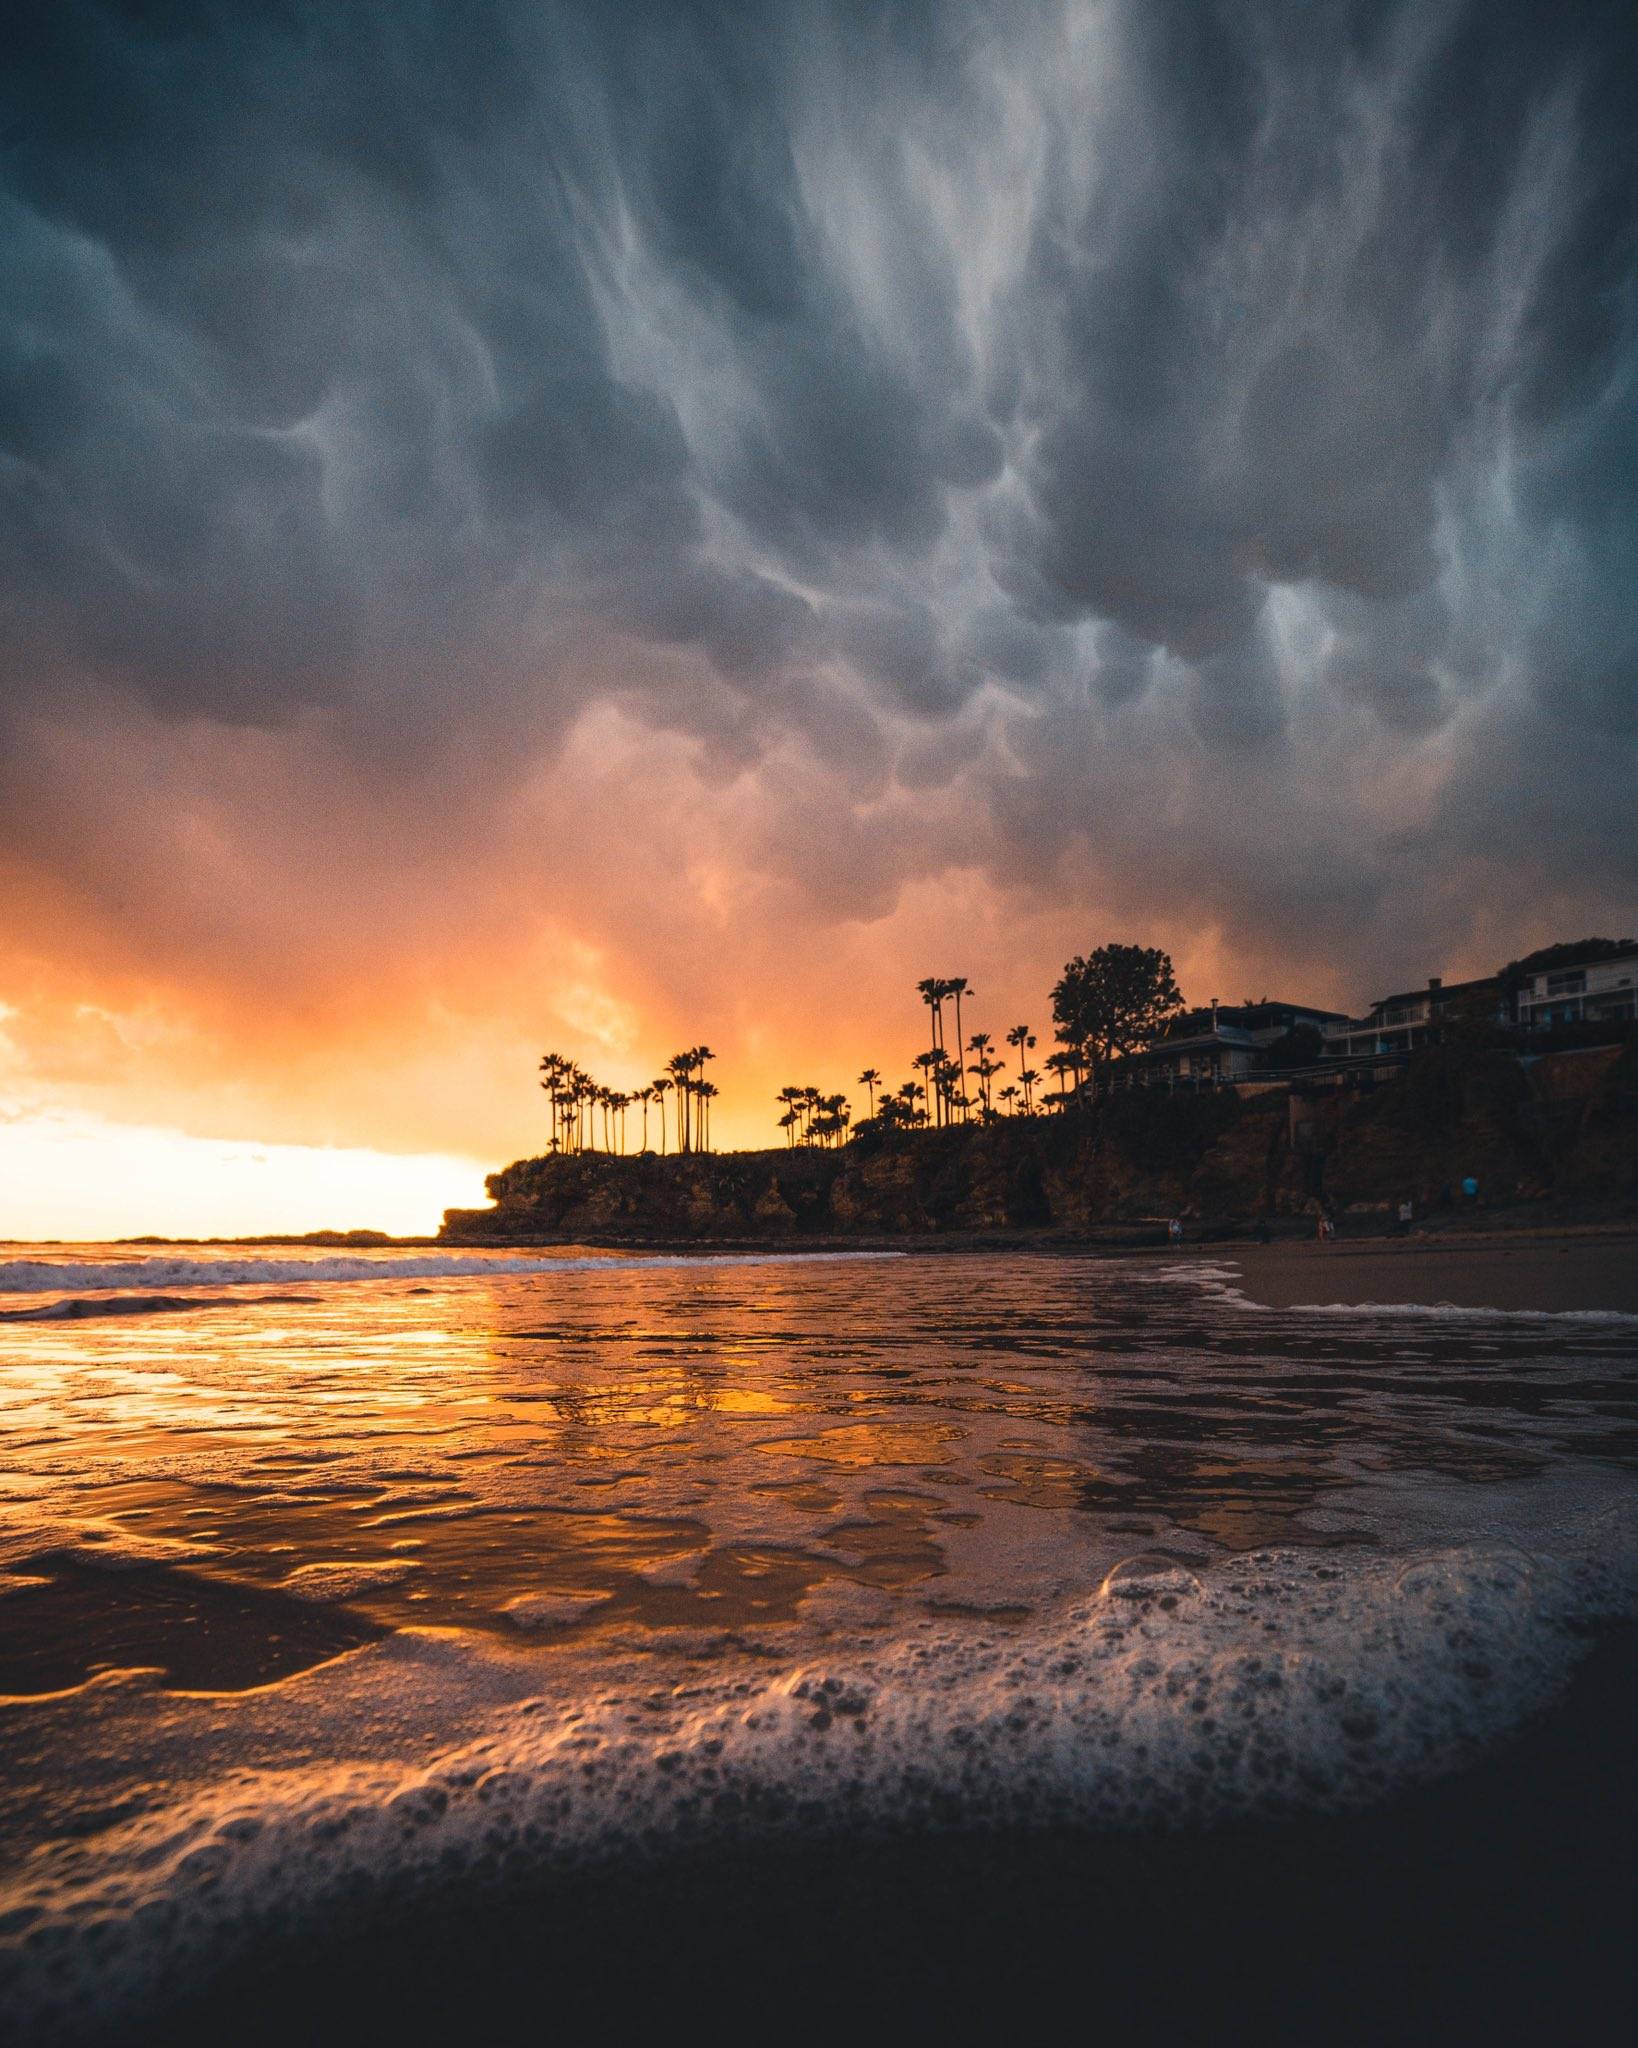 Sunset Landscape Palm Trees Beach Waves Sea Foam 1638x2048